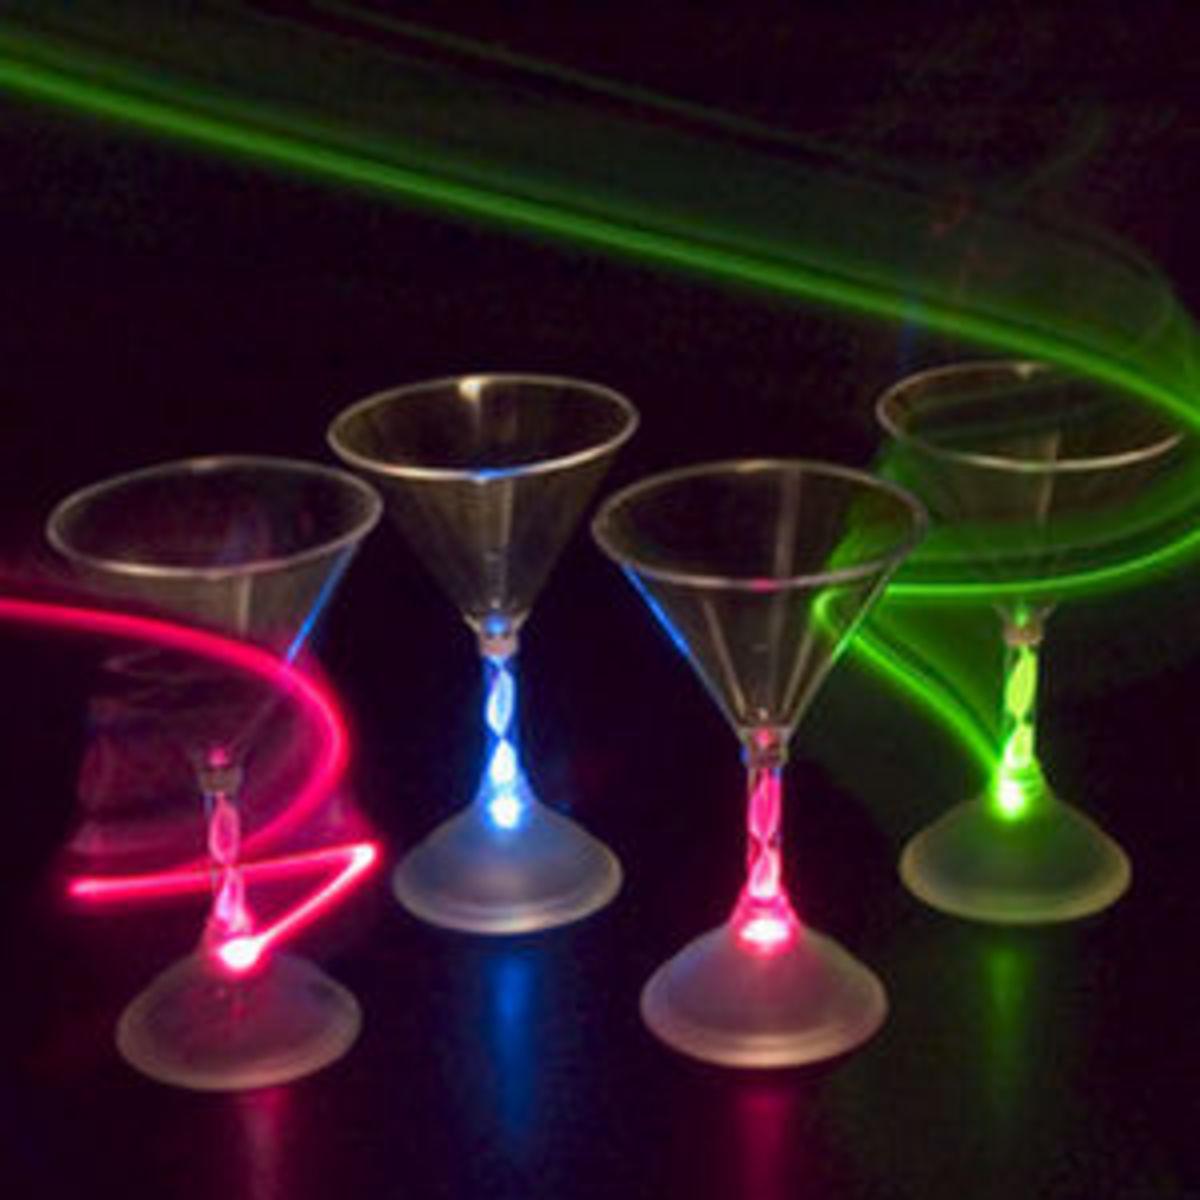 Light Up Martini Glasses